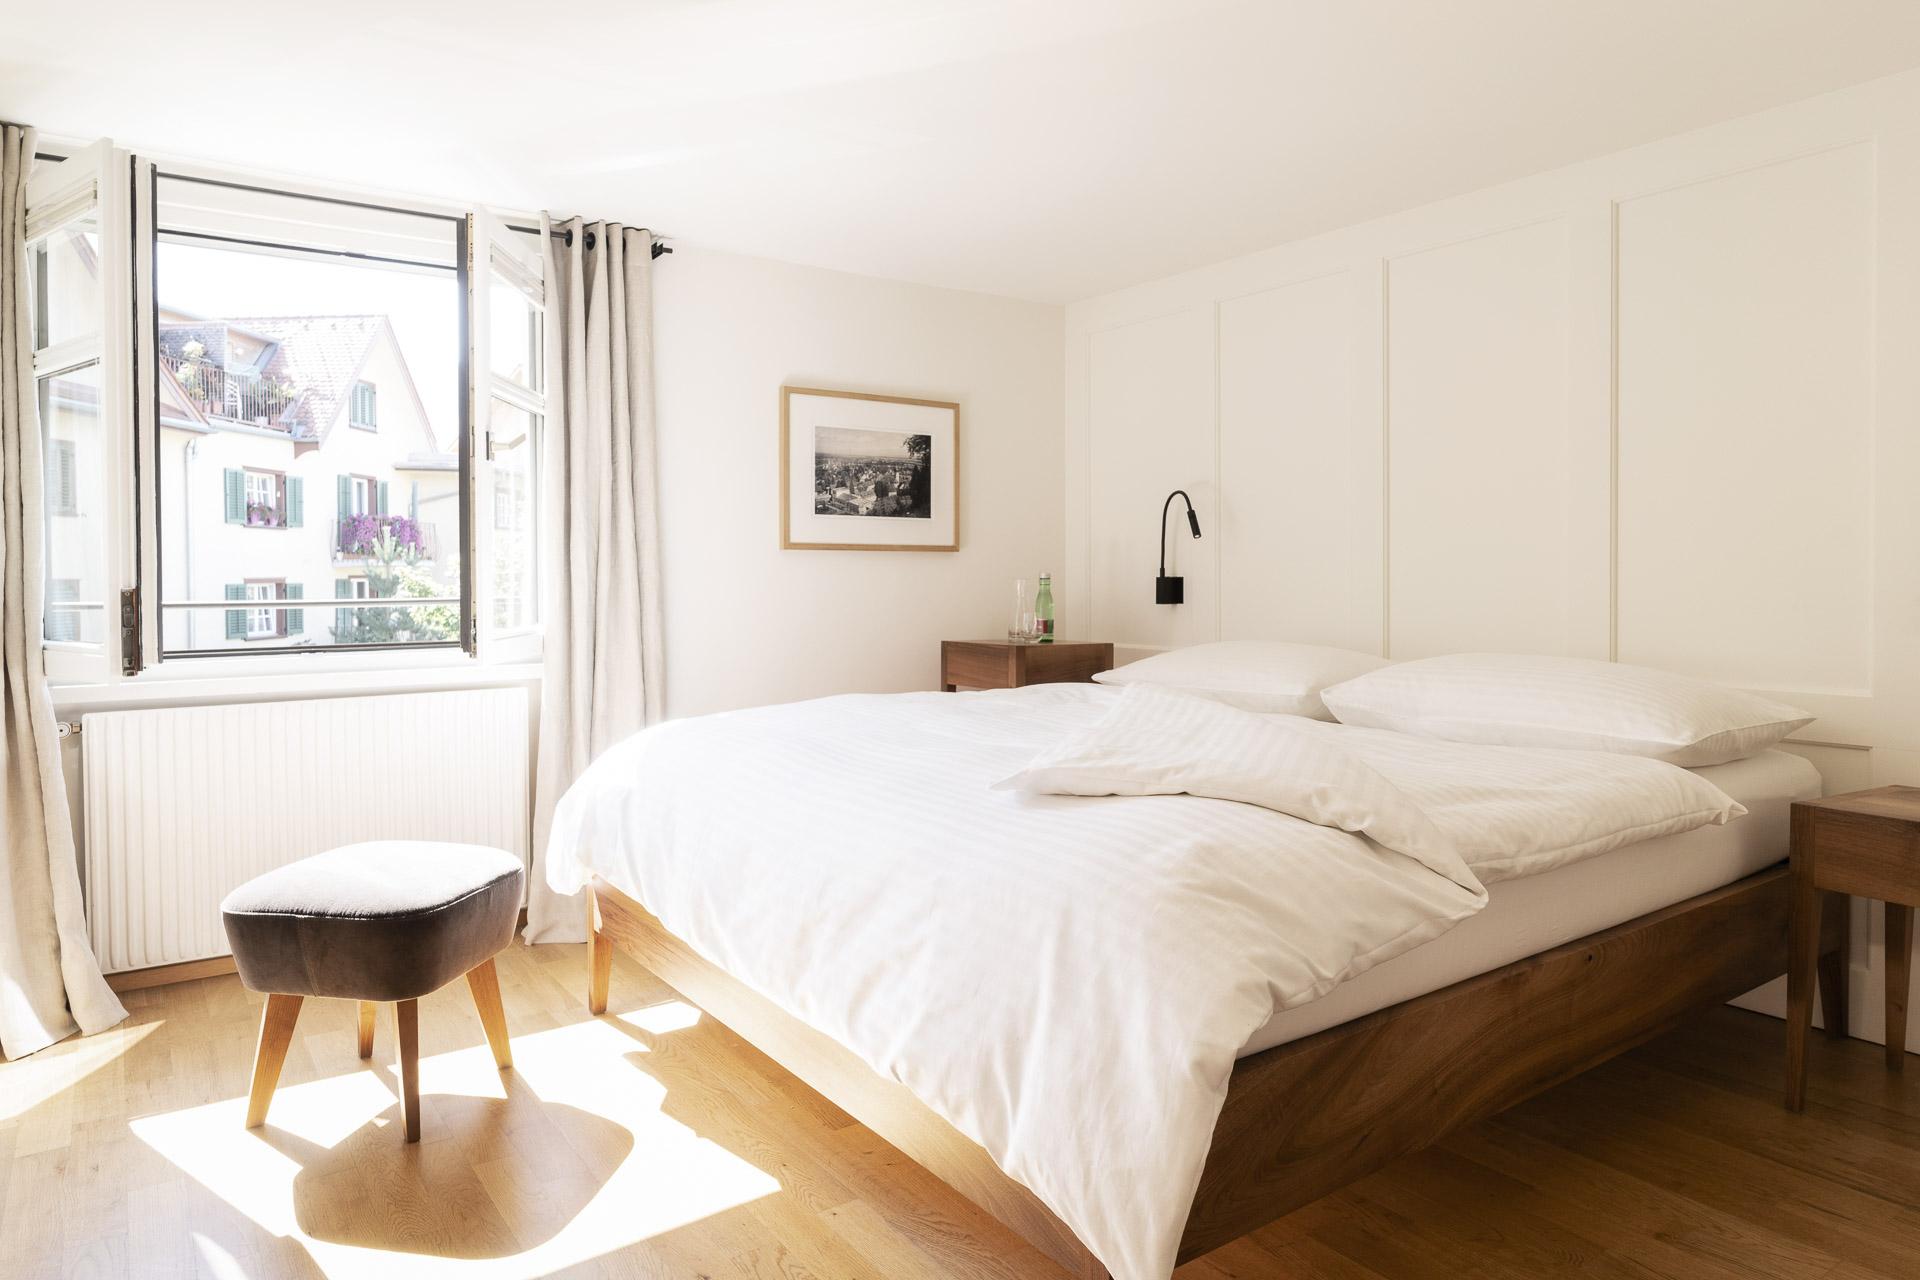 Fotowerk Hotelfotografie - helles Zimmer